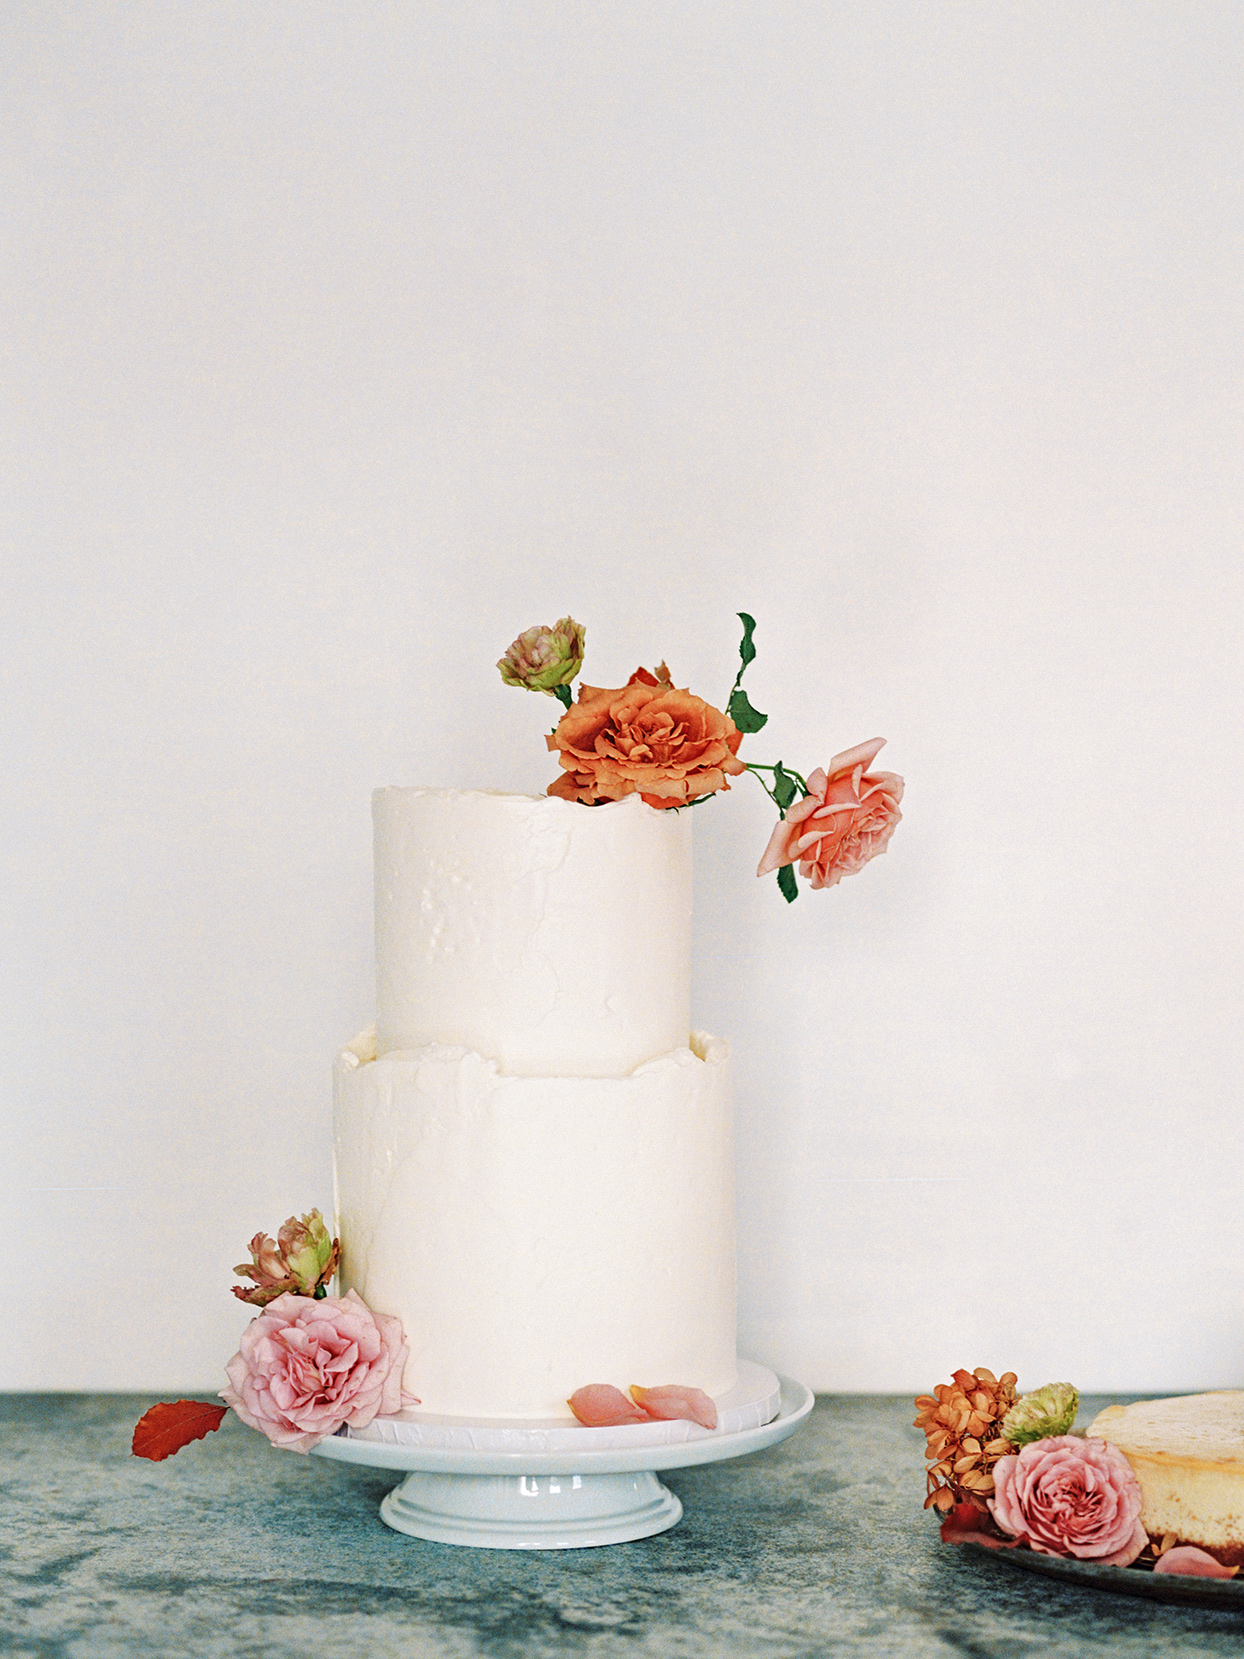 elizabeth scott white wedding cake with pink and orange flowers